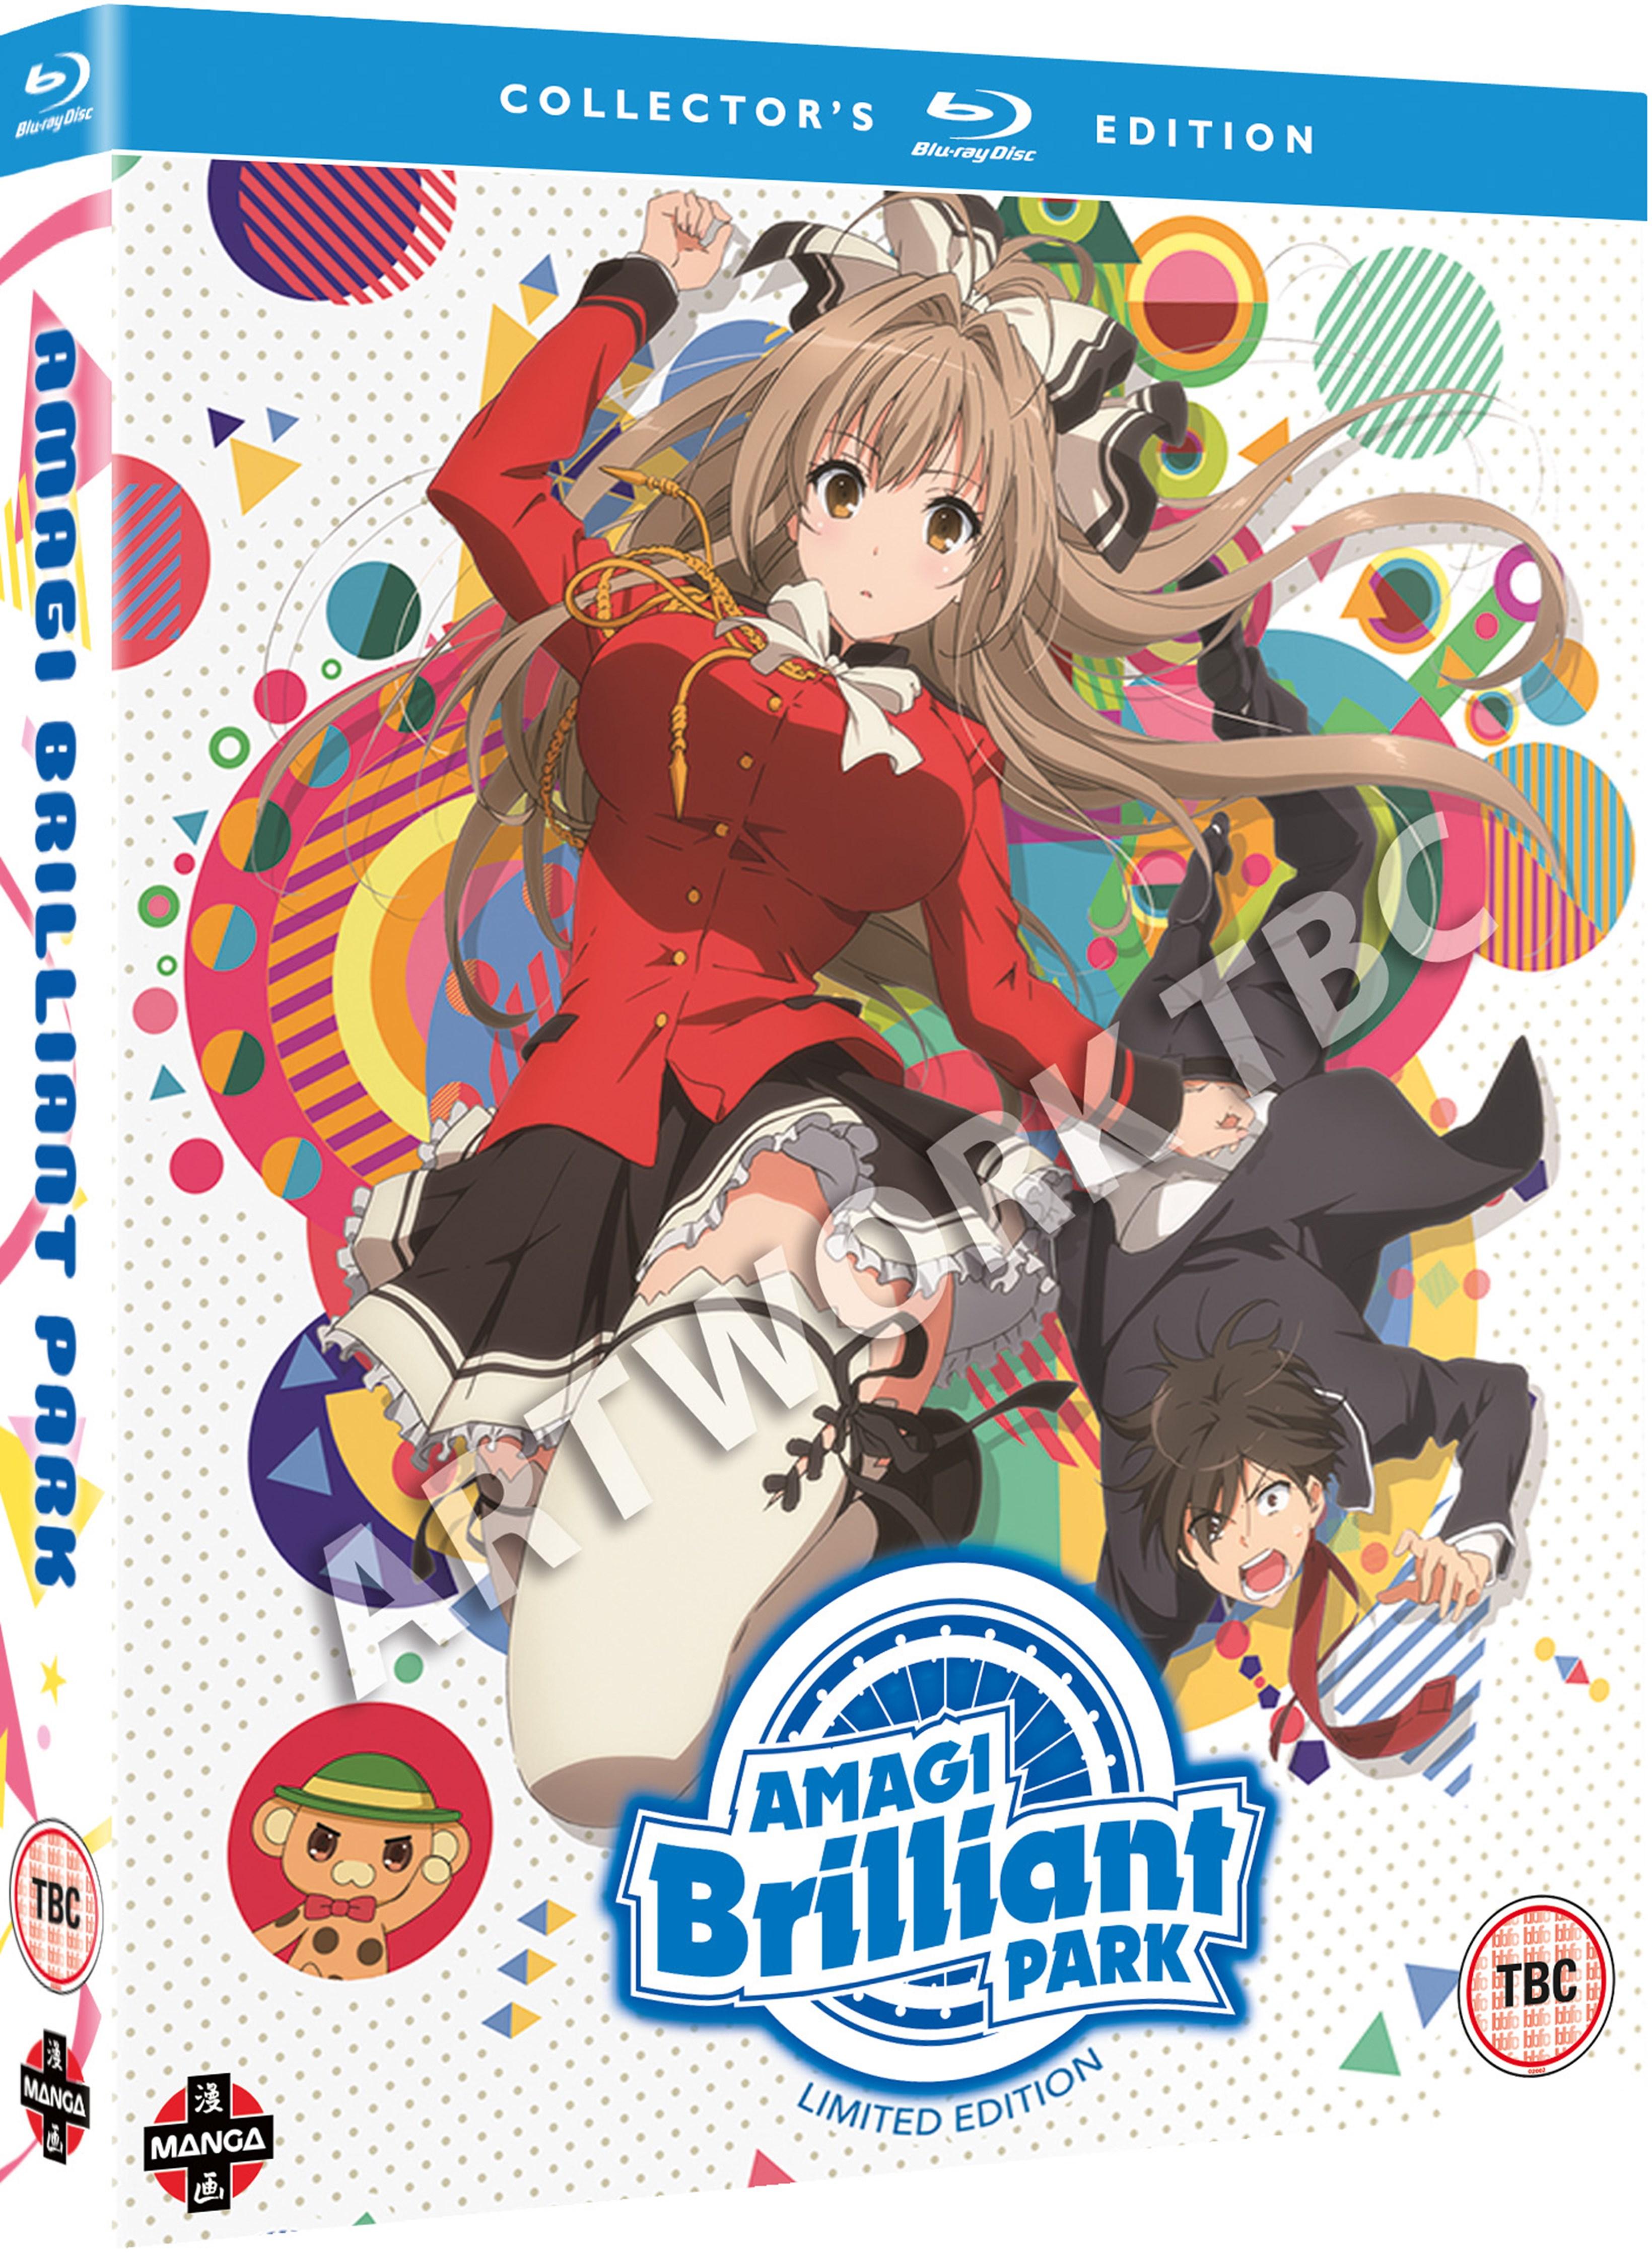 Amagi Brilliant Park: Complete Season 1 Collection - 2